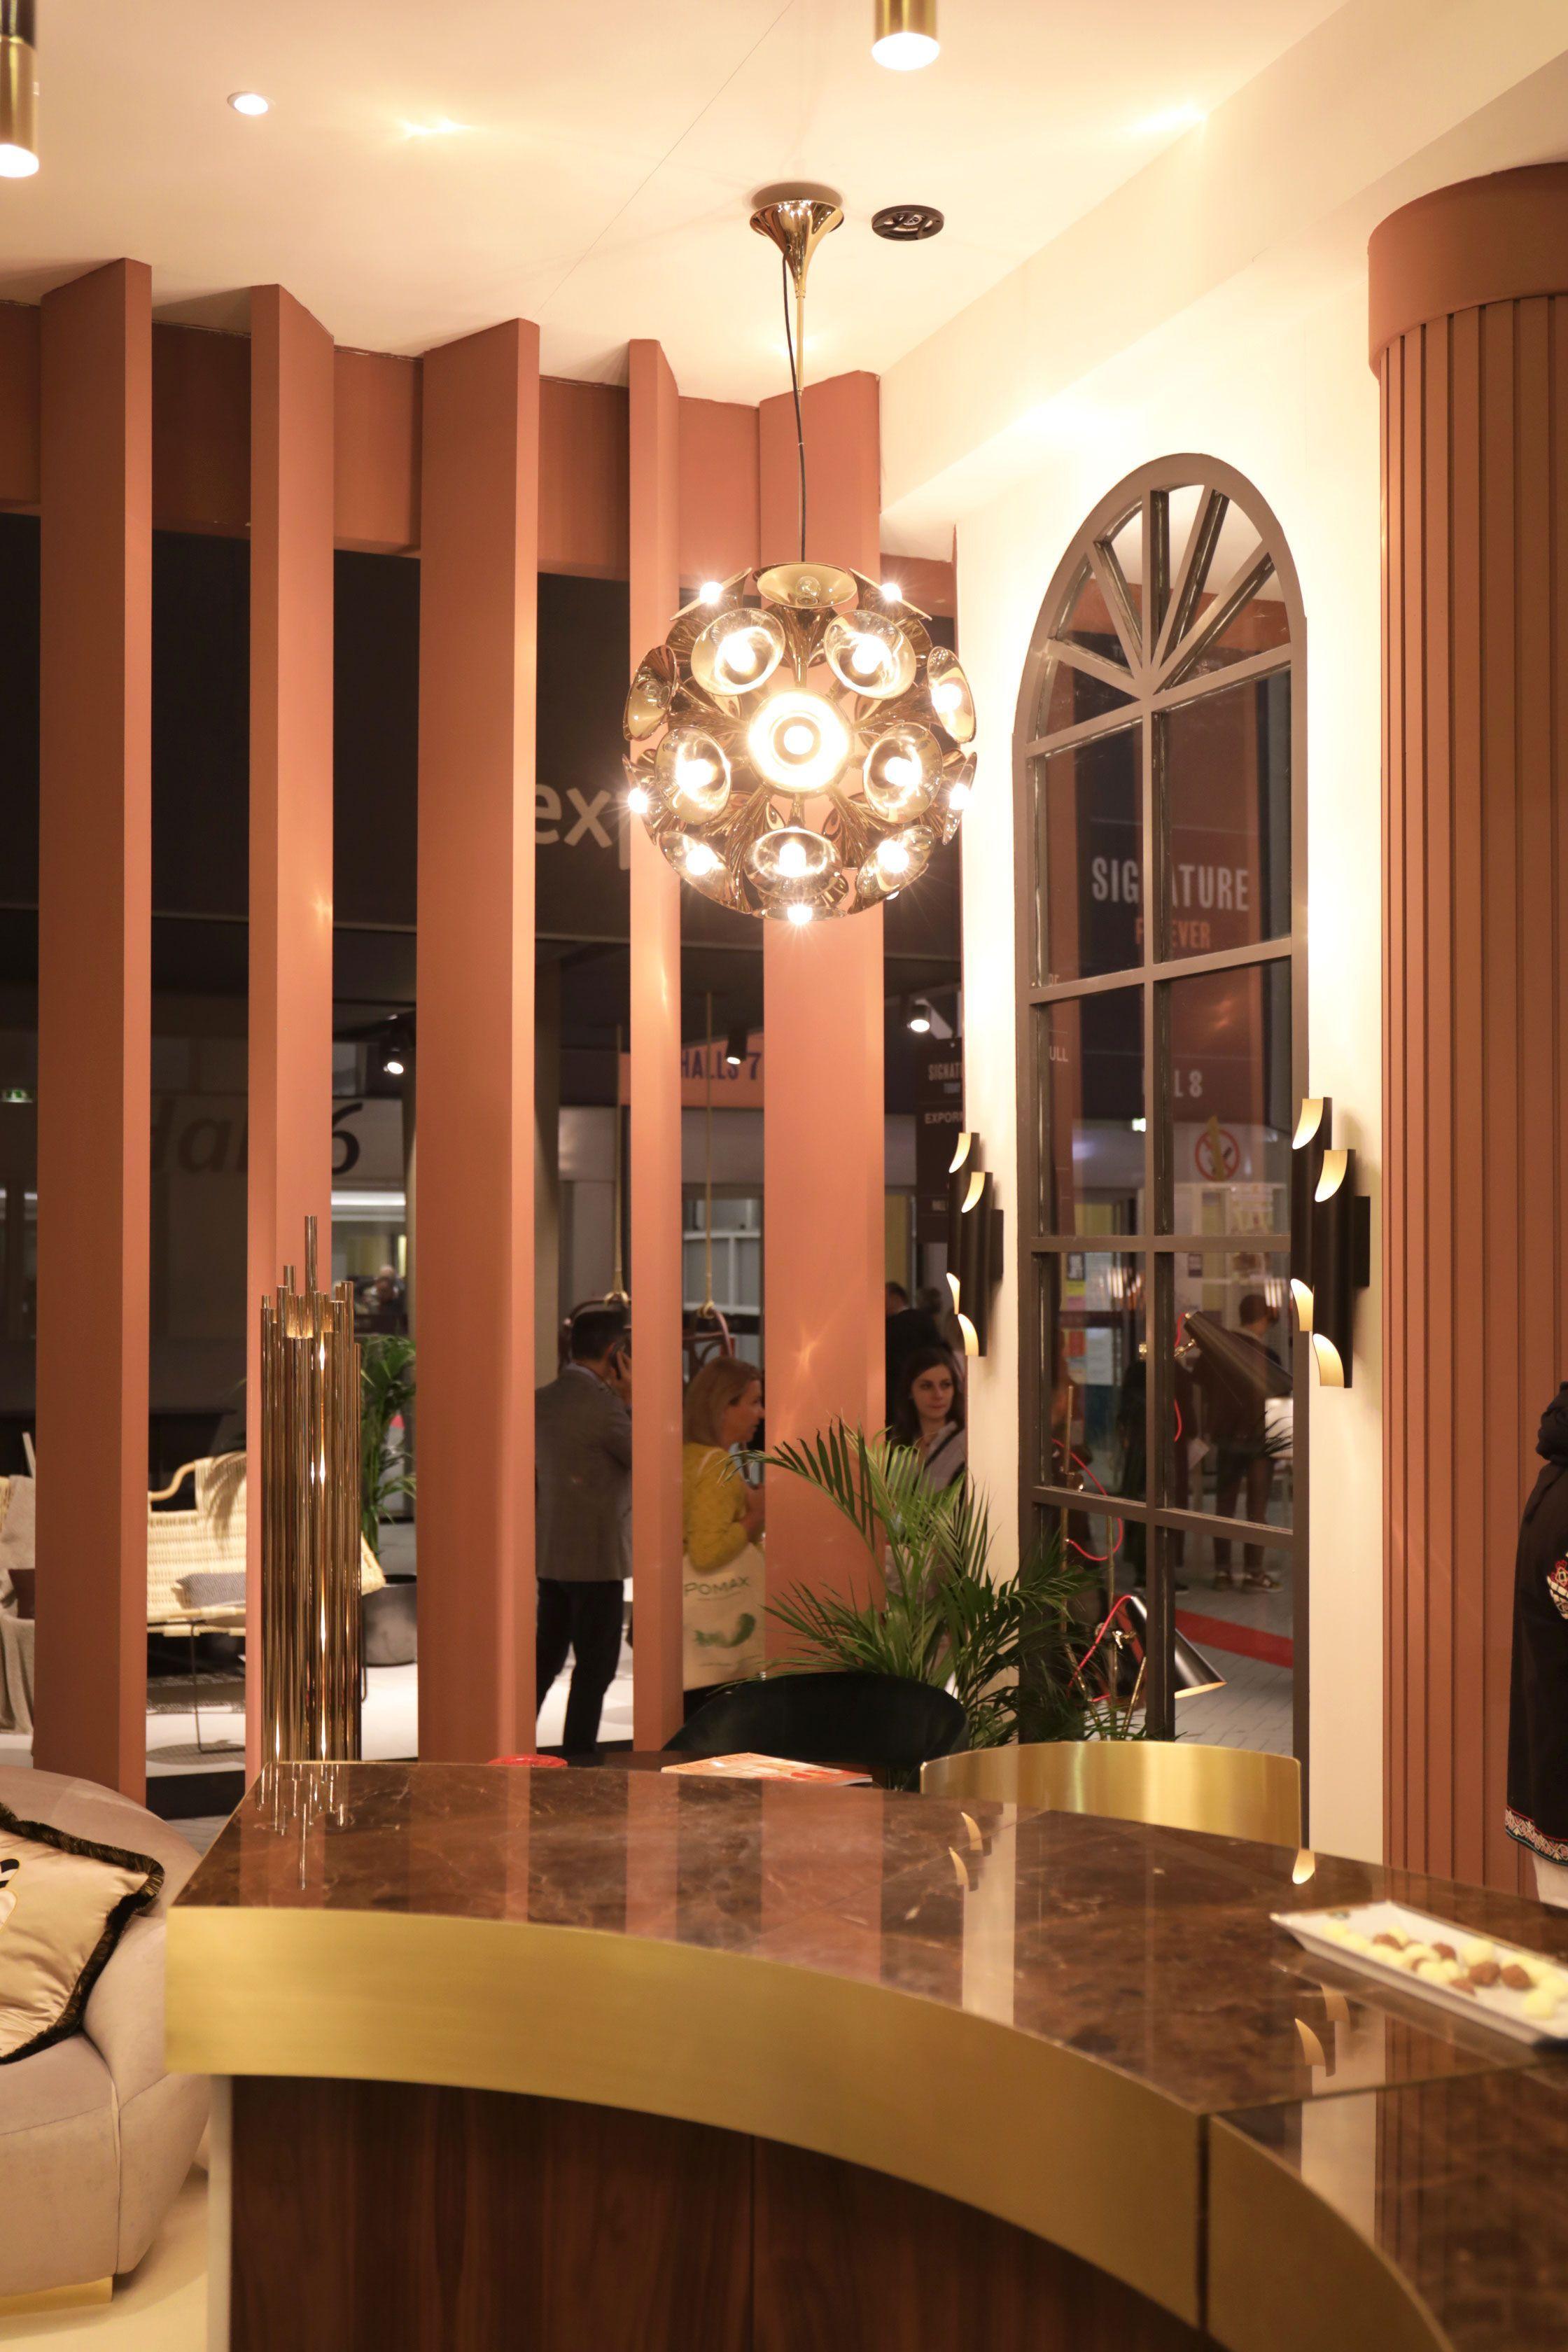 Interior Design Trends Presented At Maison Objet 2019 Luxury Interior Design Cool Lighting Interior Design Inspiration